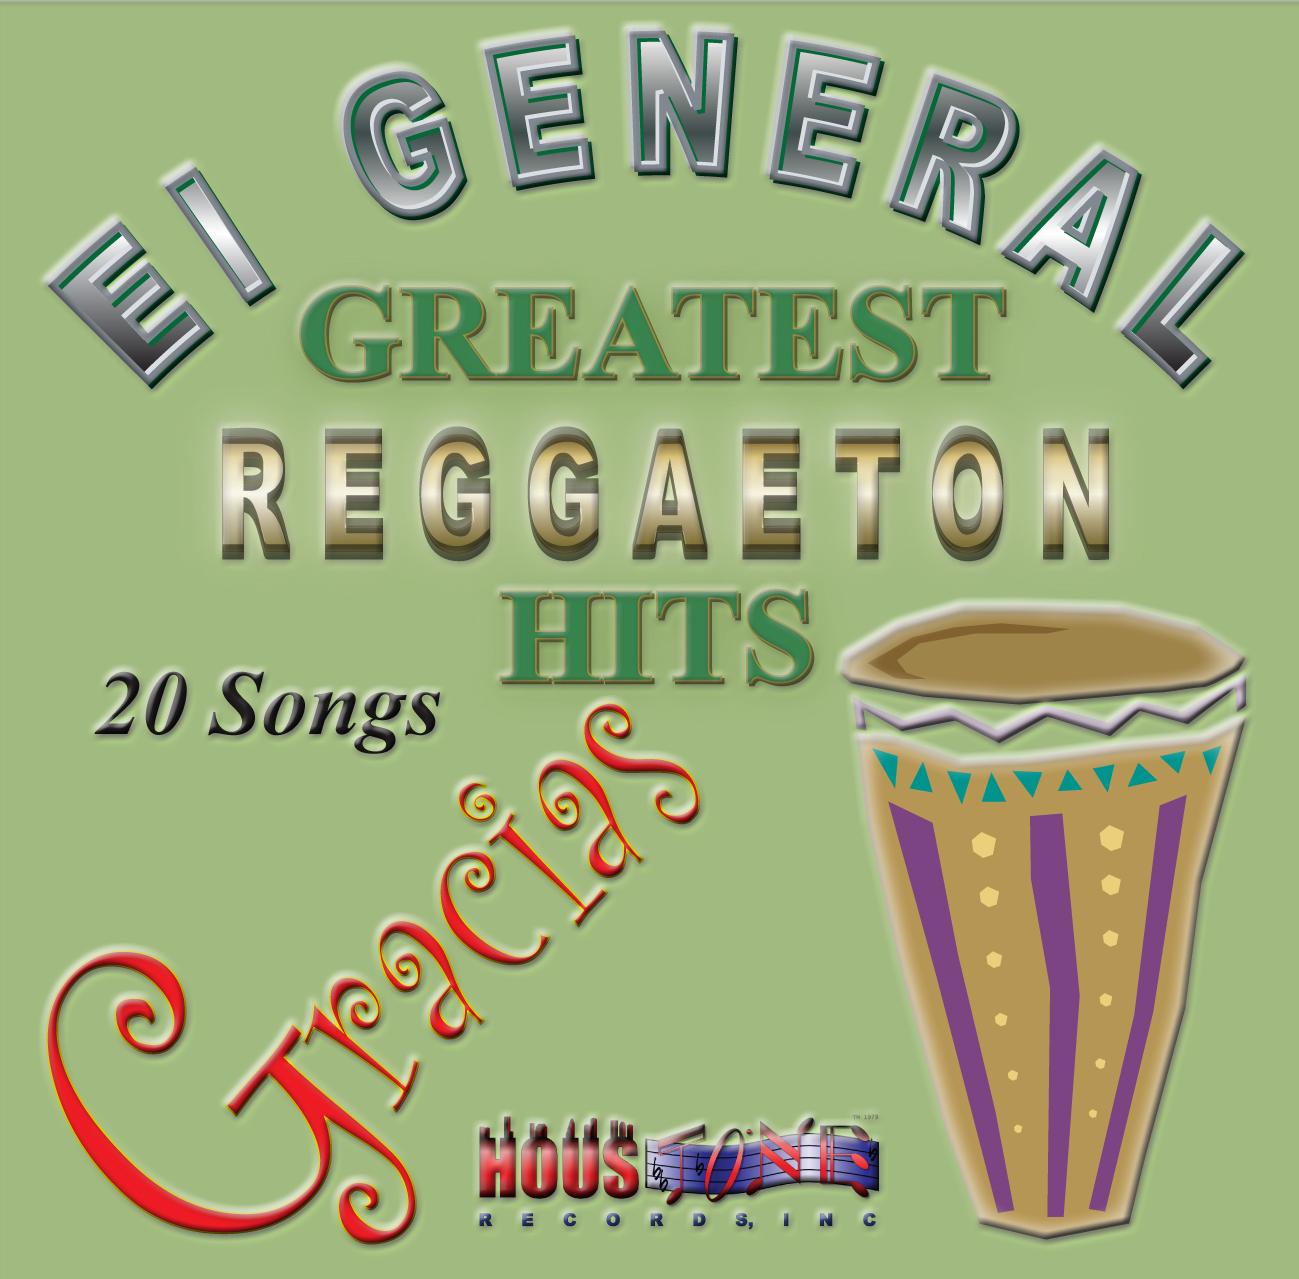 Gracias, EL General Greatest Reggaeton Hits (Re-Mastered)